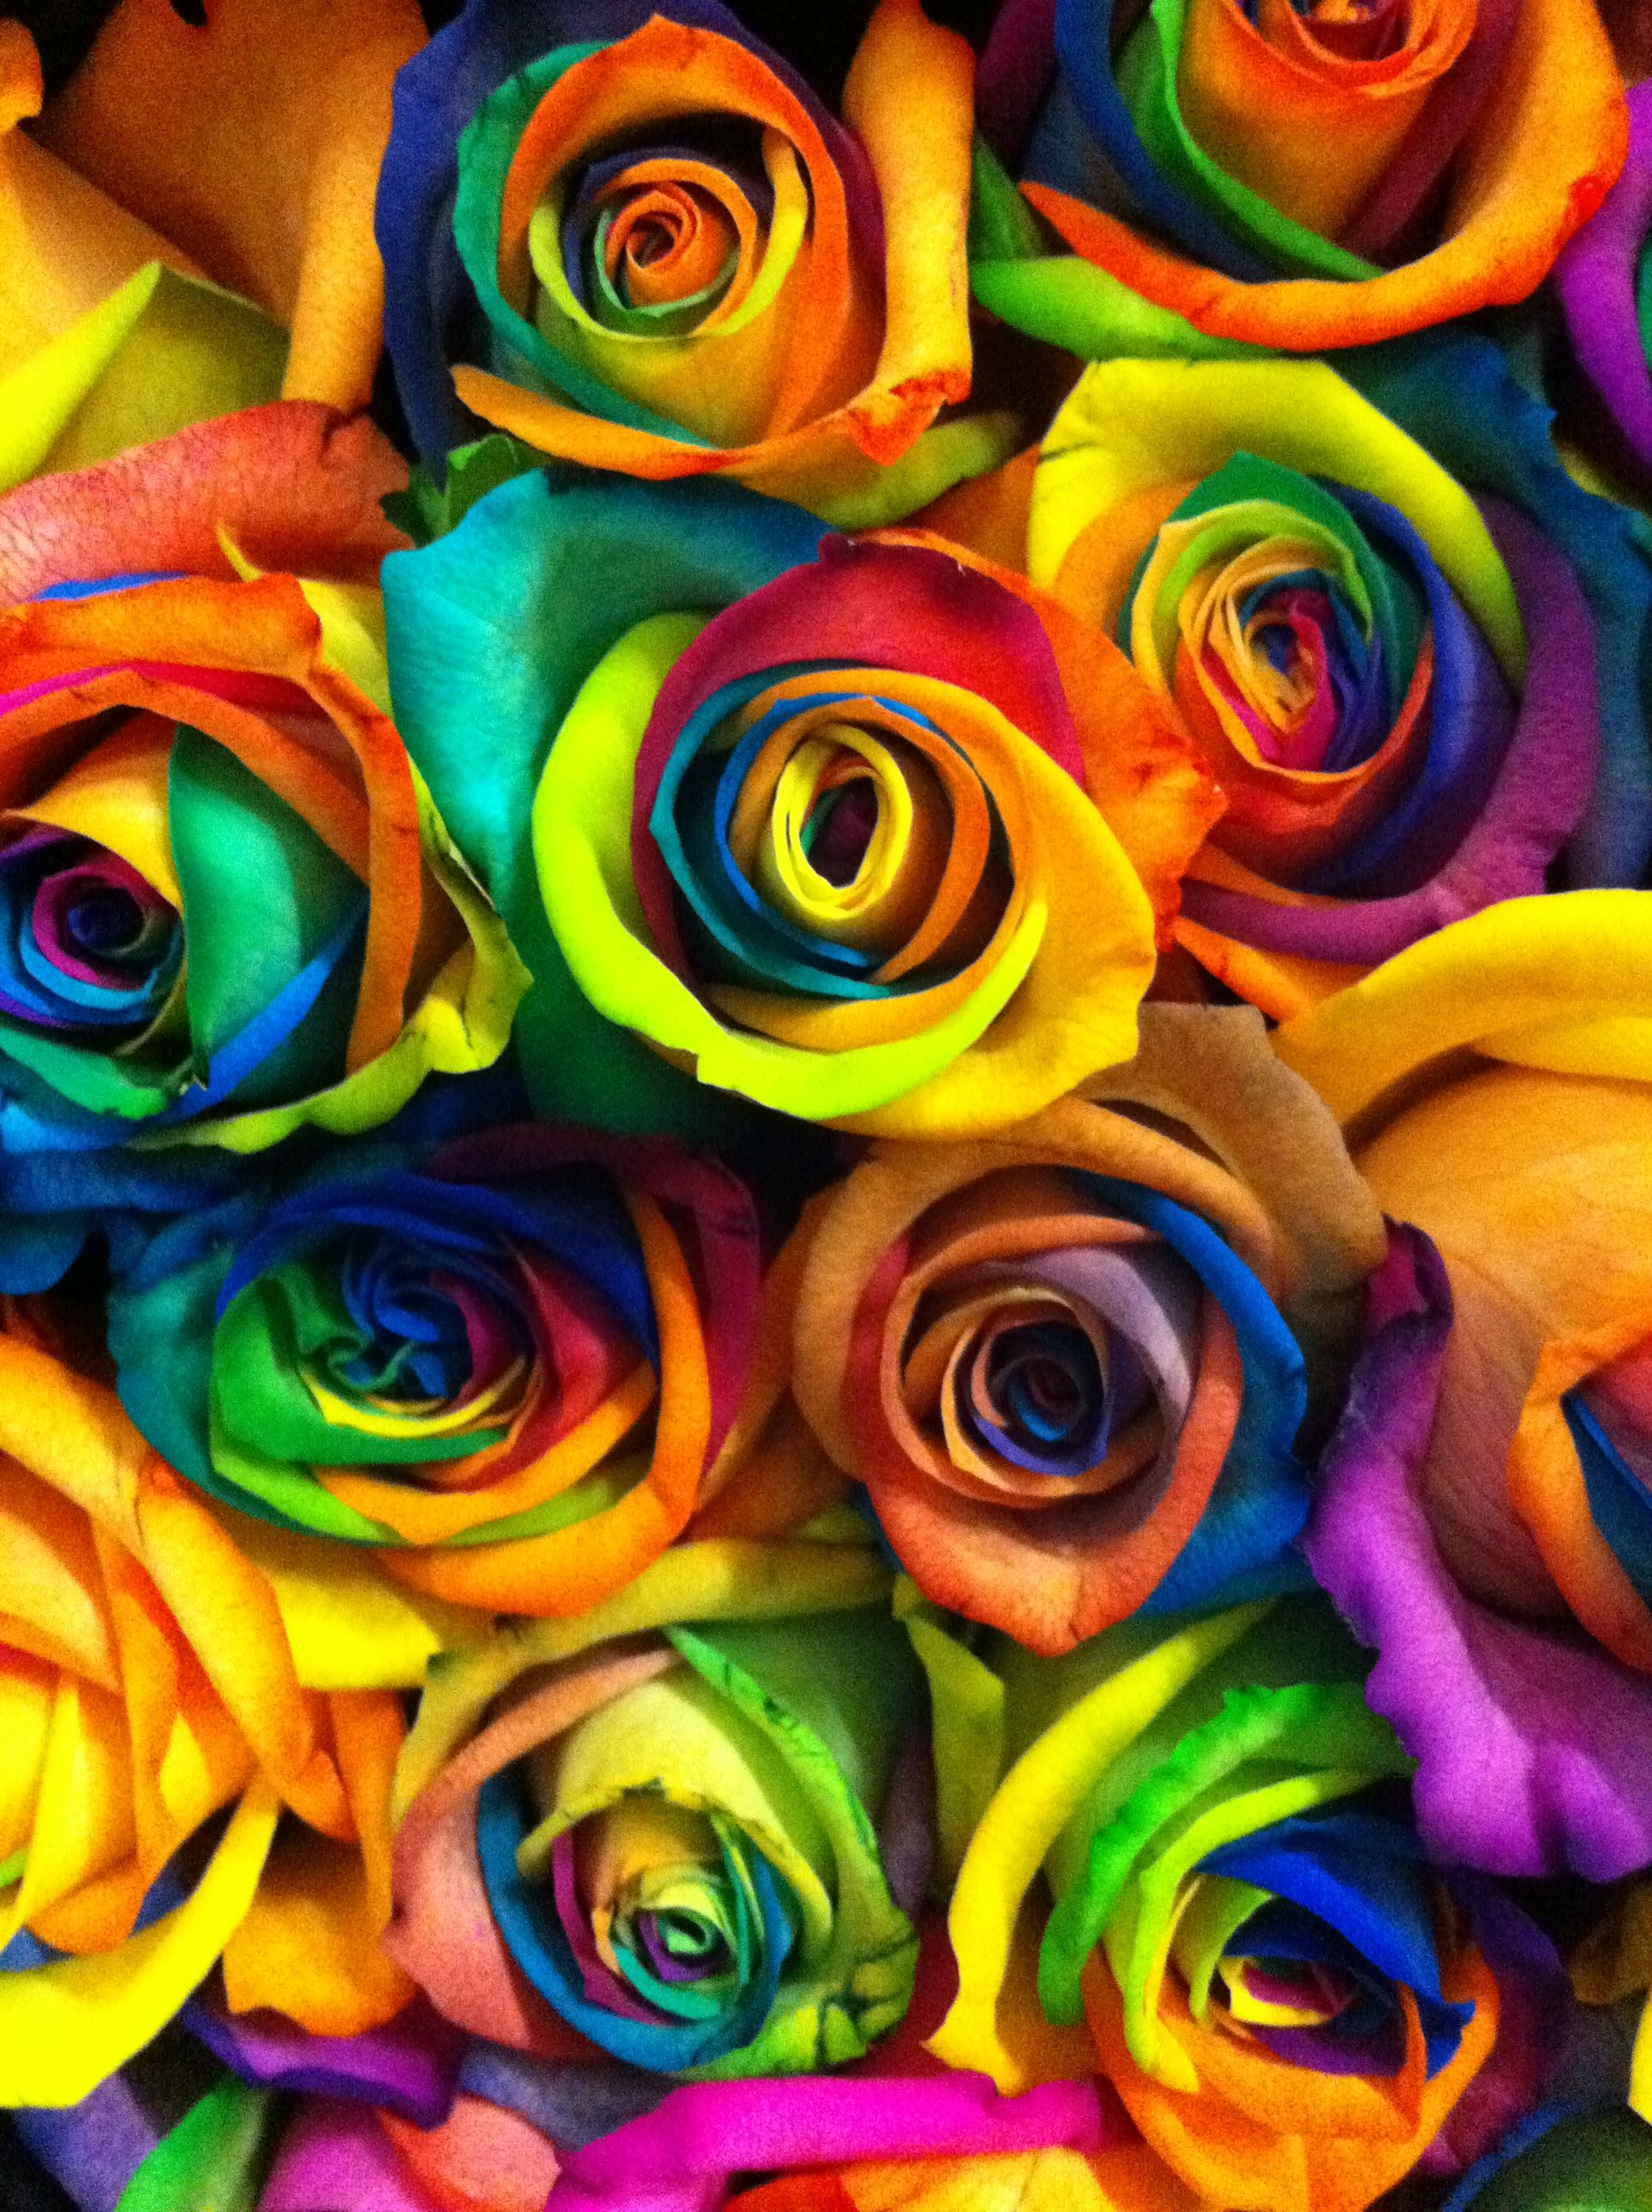 Rainbow Flower Rose Art Iphone 7 Wallpapers Rainbow Roses